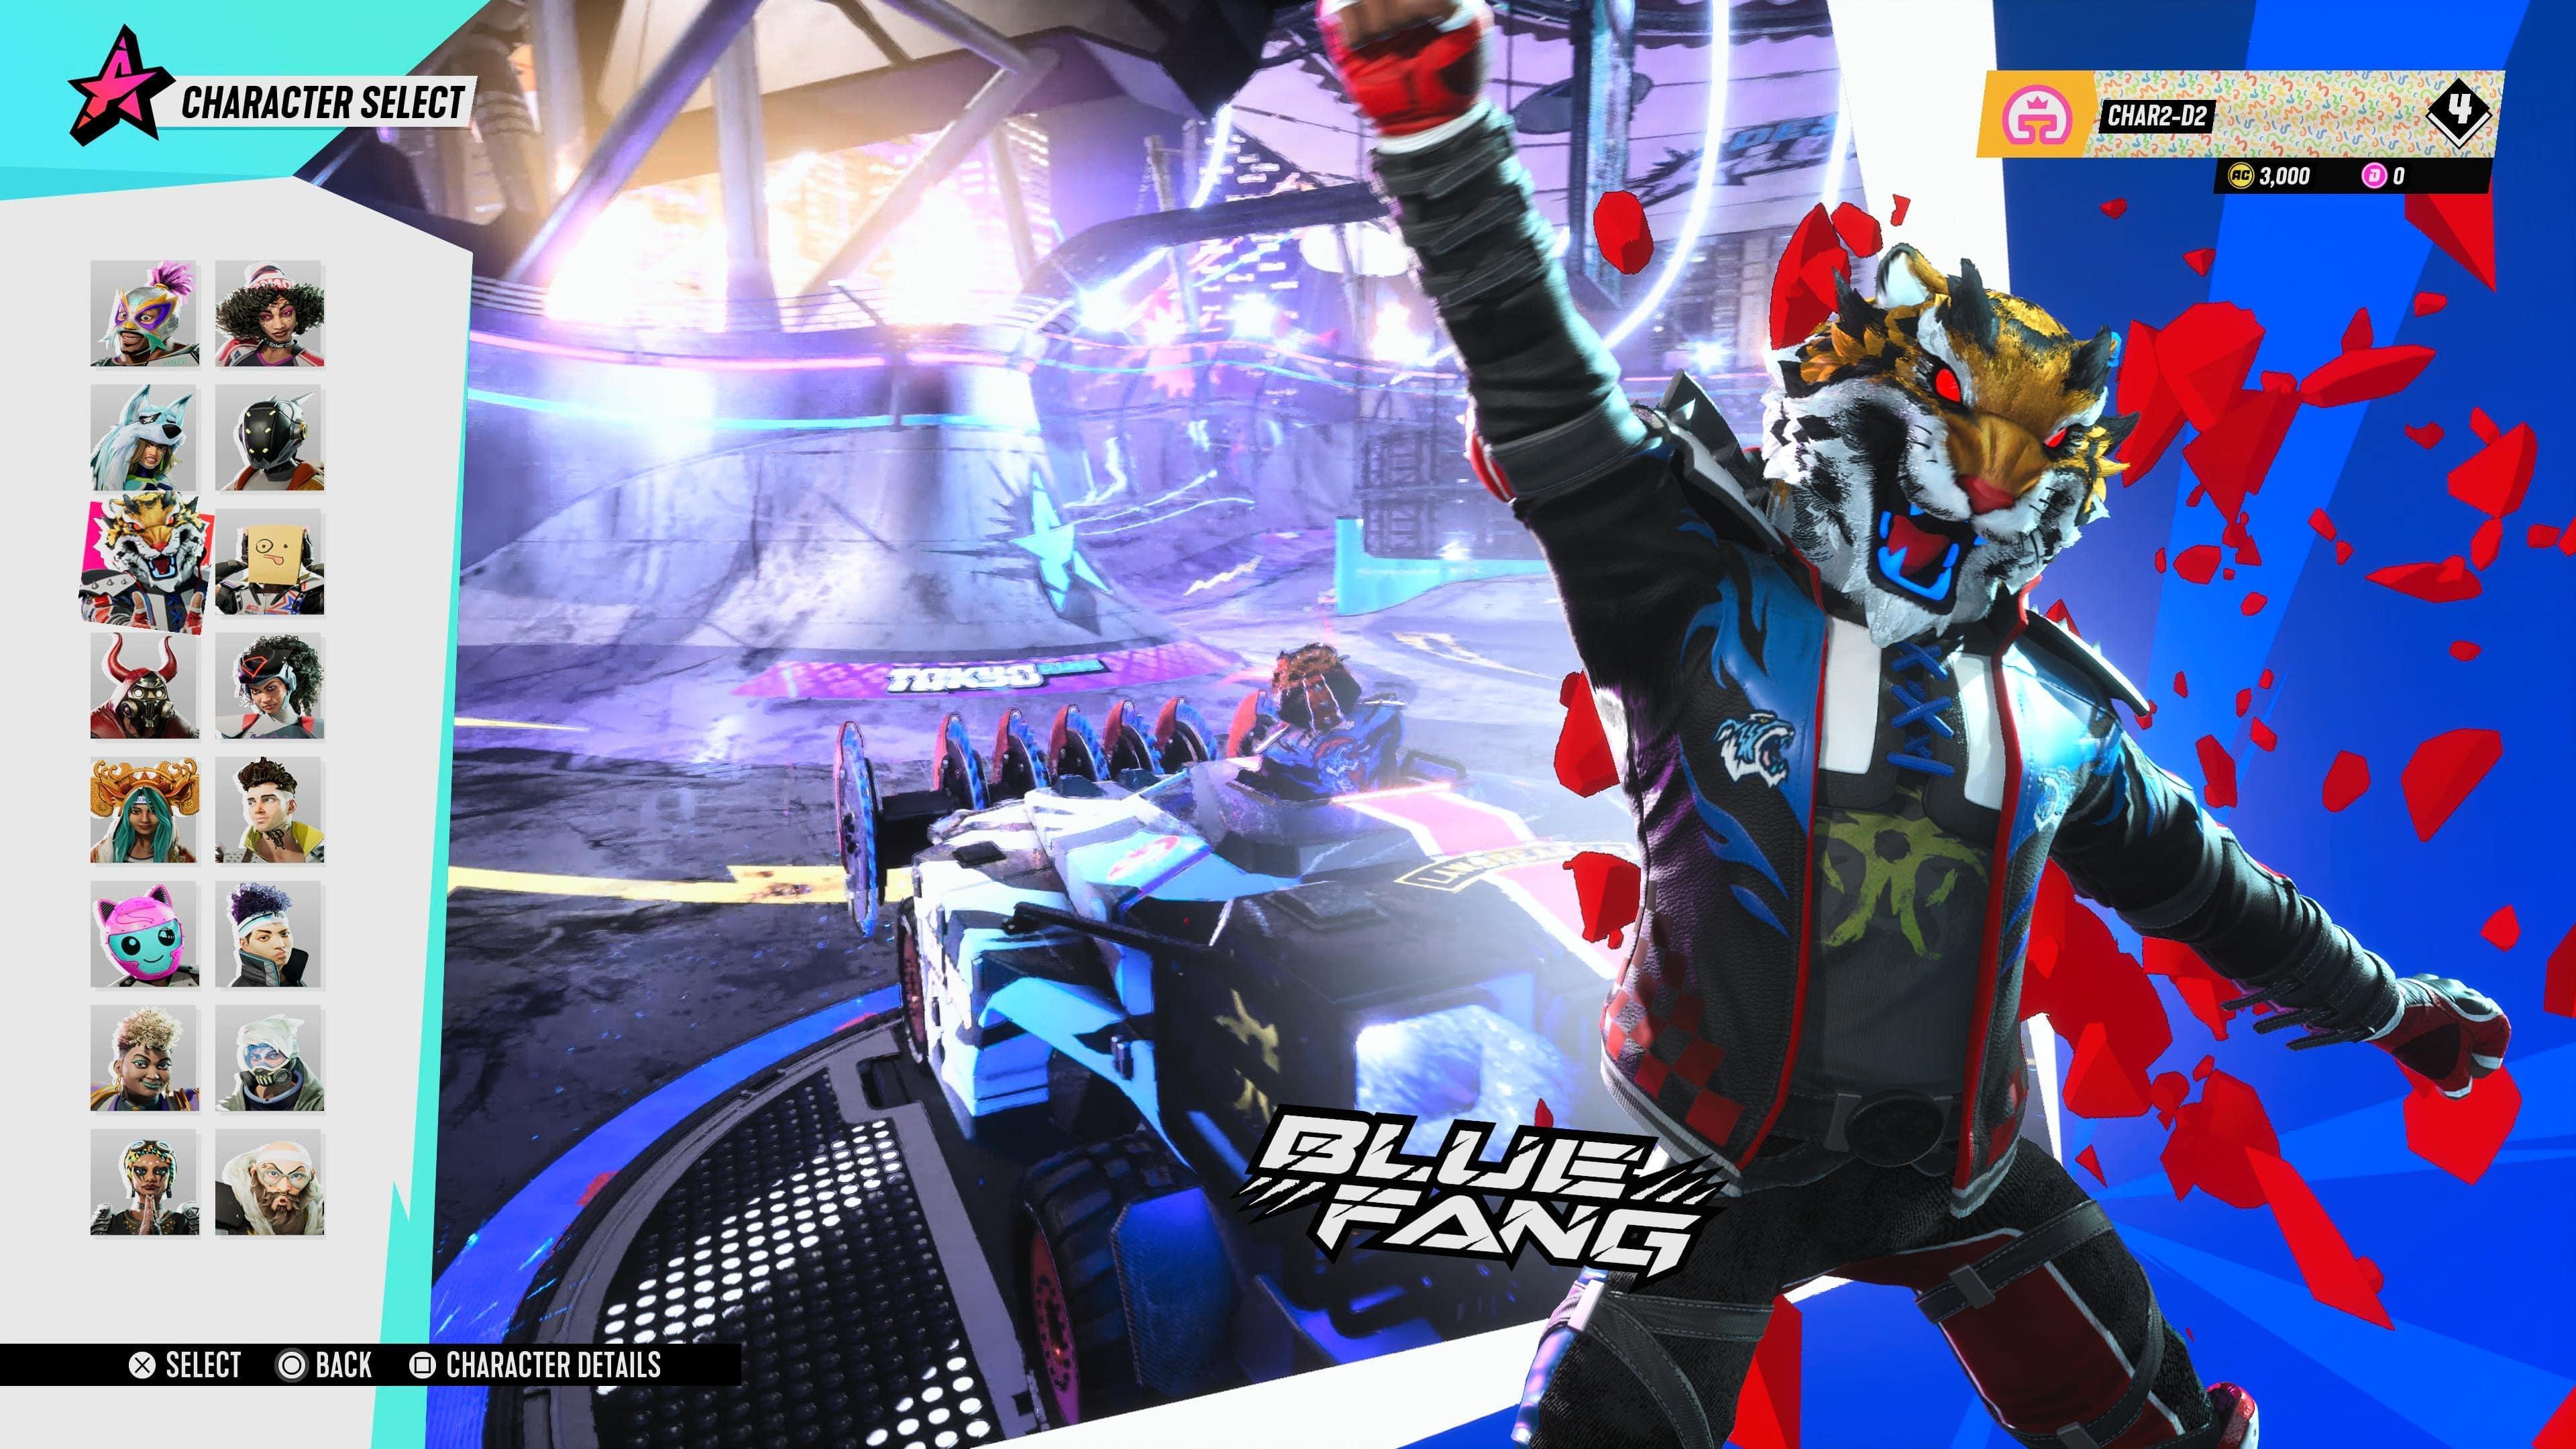 Character selection screen on Destruction AllStars featuring Bluefang